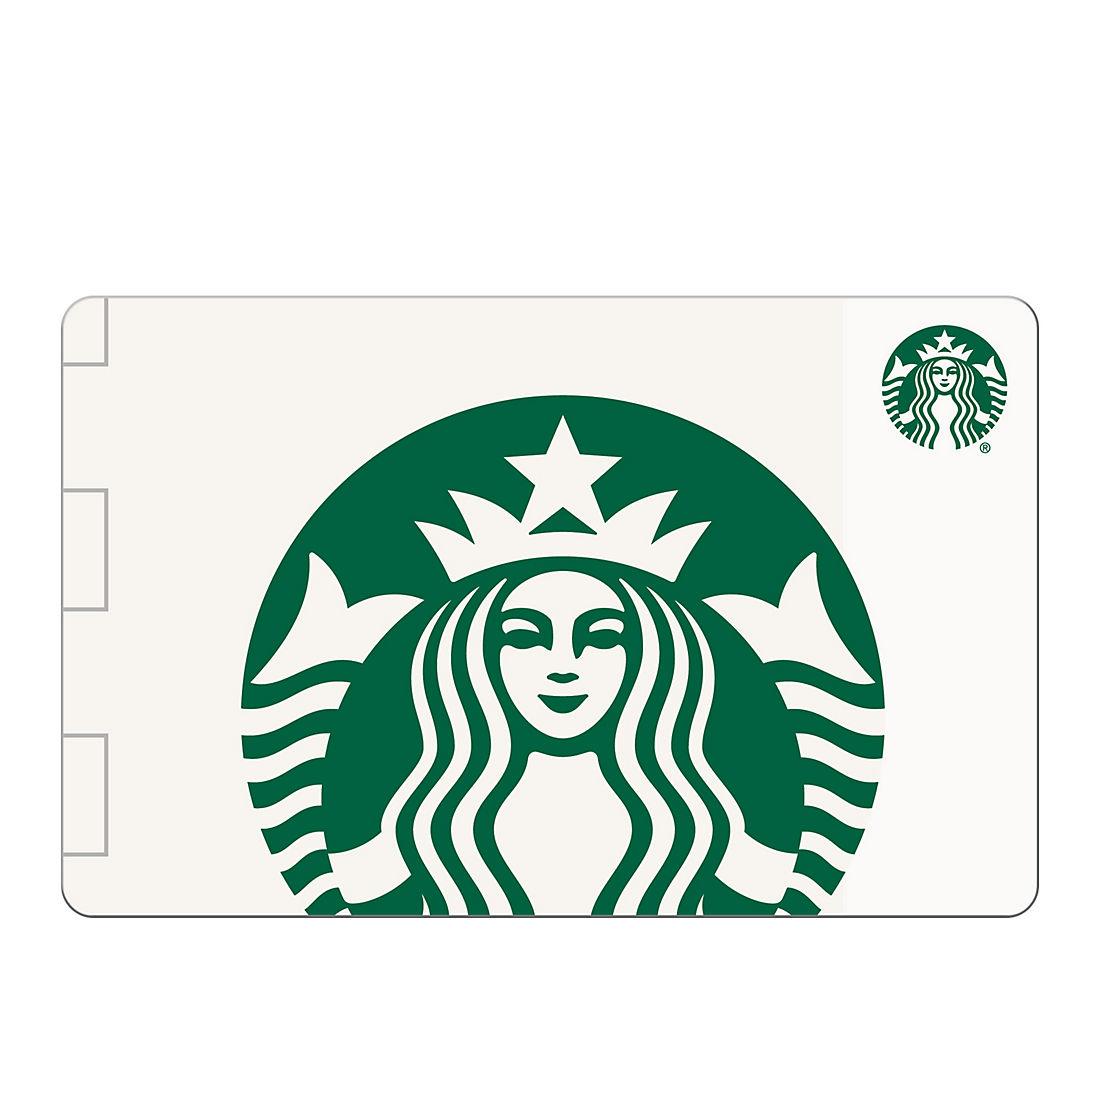 $6 Starbucks Gift Card, 6 pk. - BJs WholeSale Club